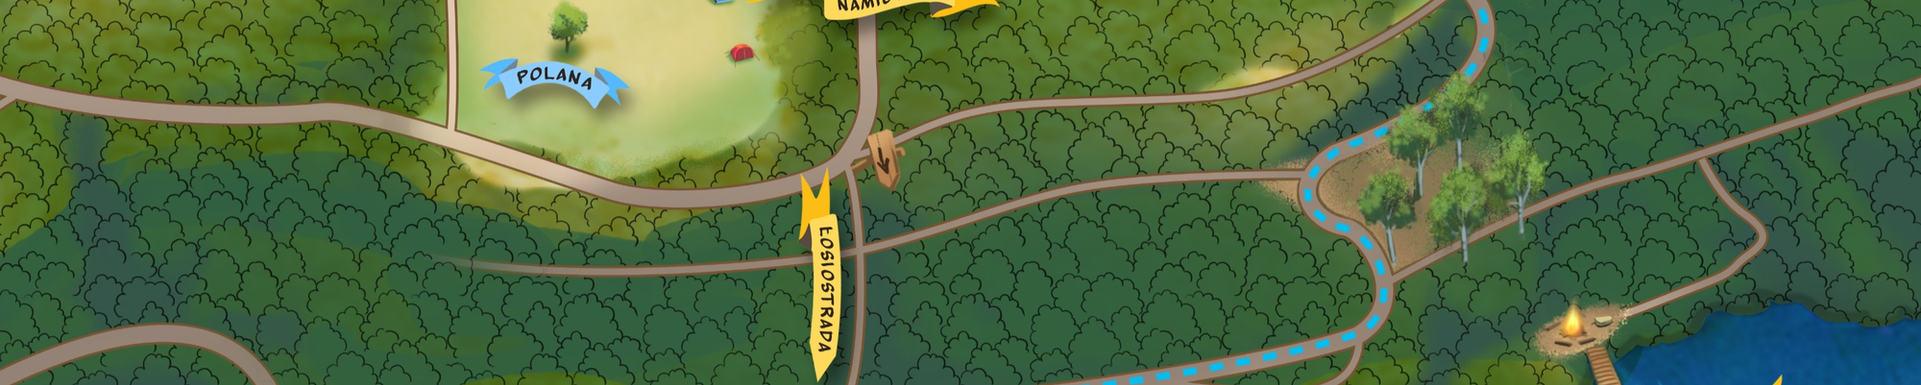 mapa%20alaska%20mala_edited.jpg